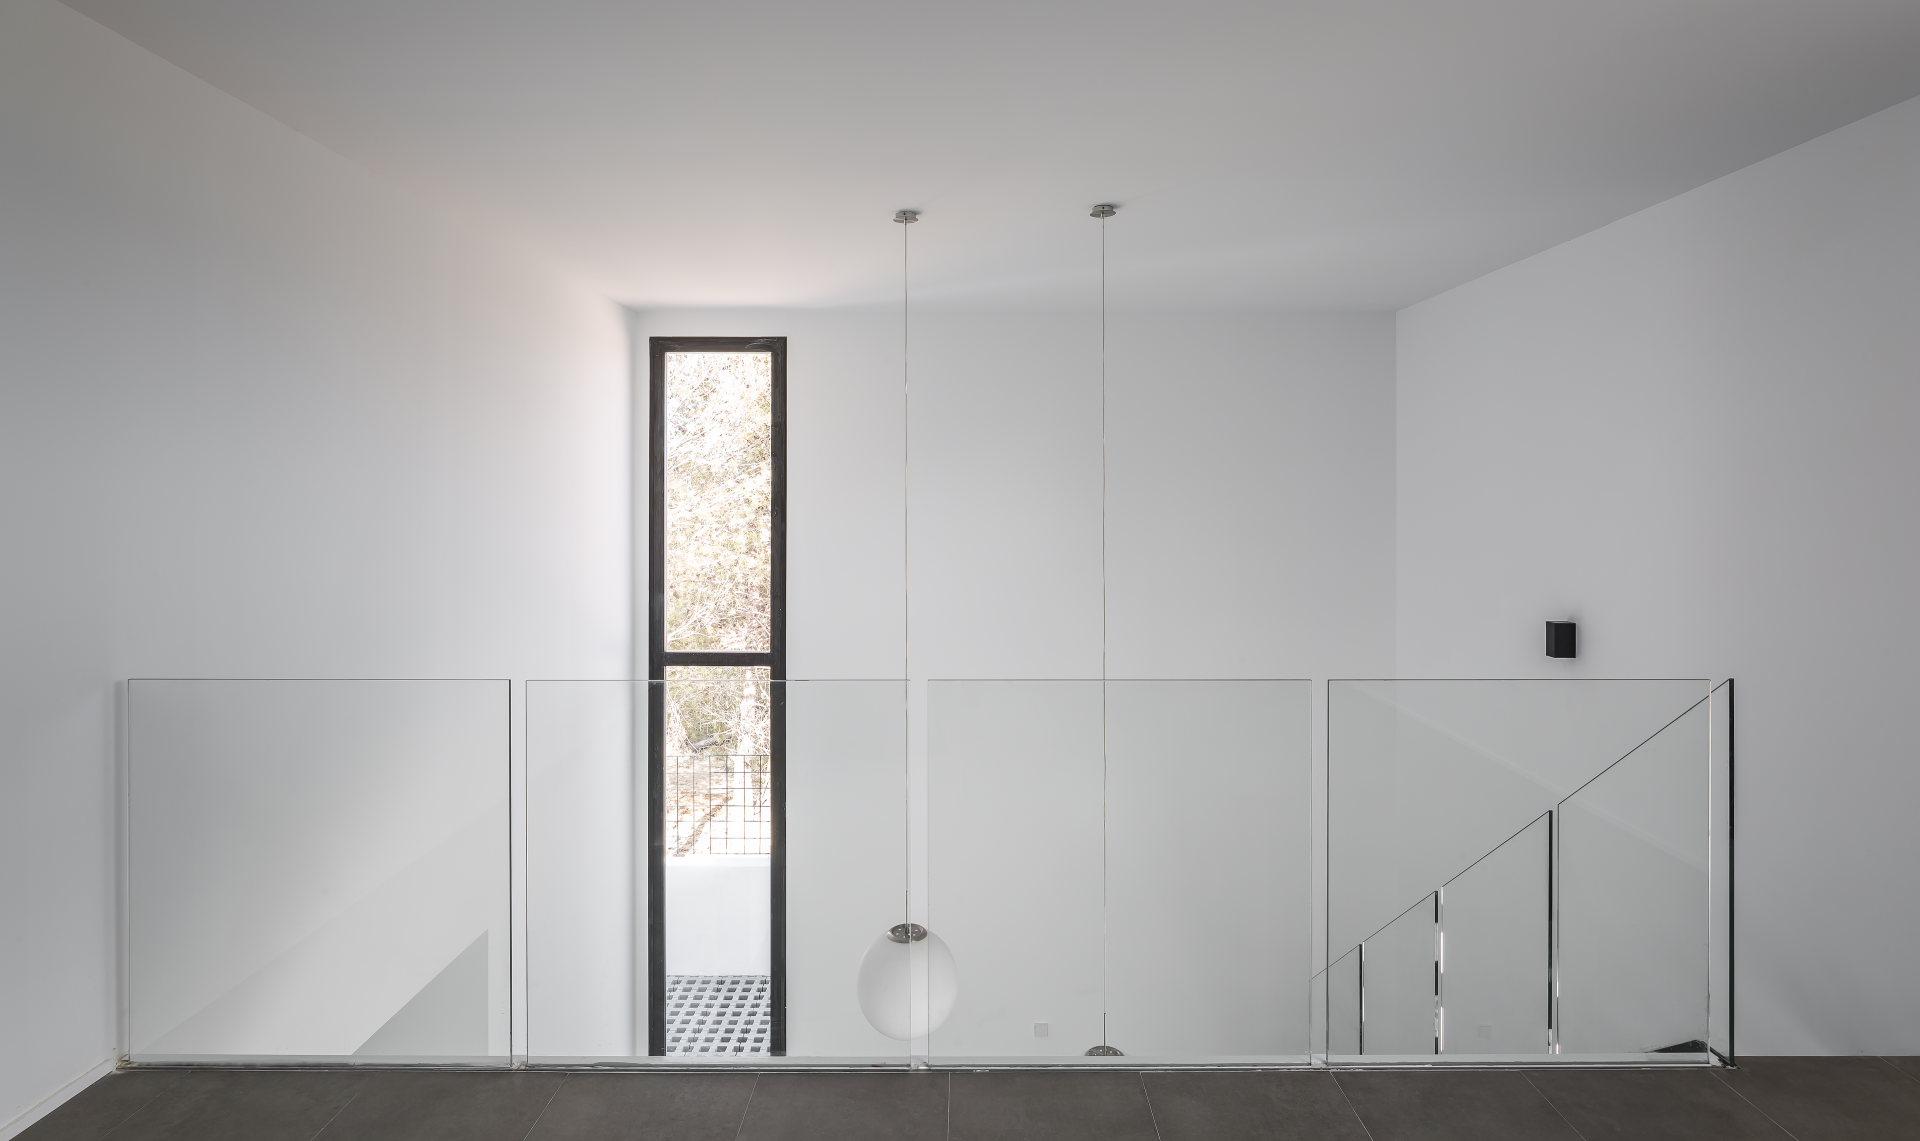 fotografia-arquitectura-valencia-german-cabo-viraje-el-vedat-torrent (24)